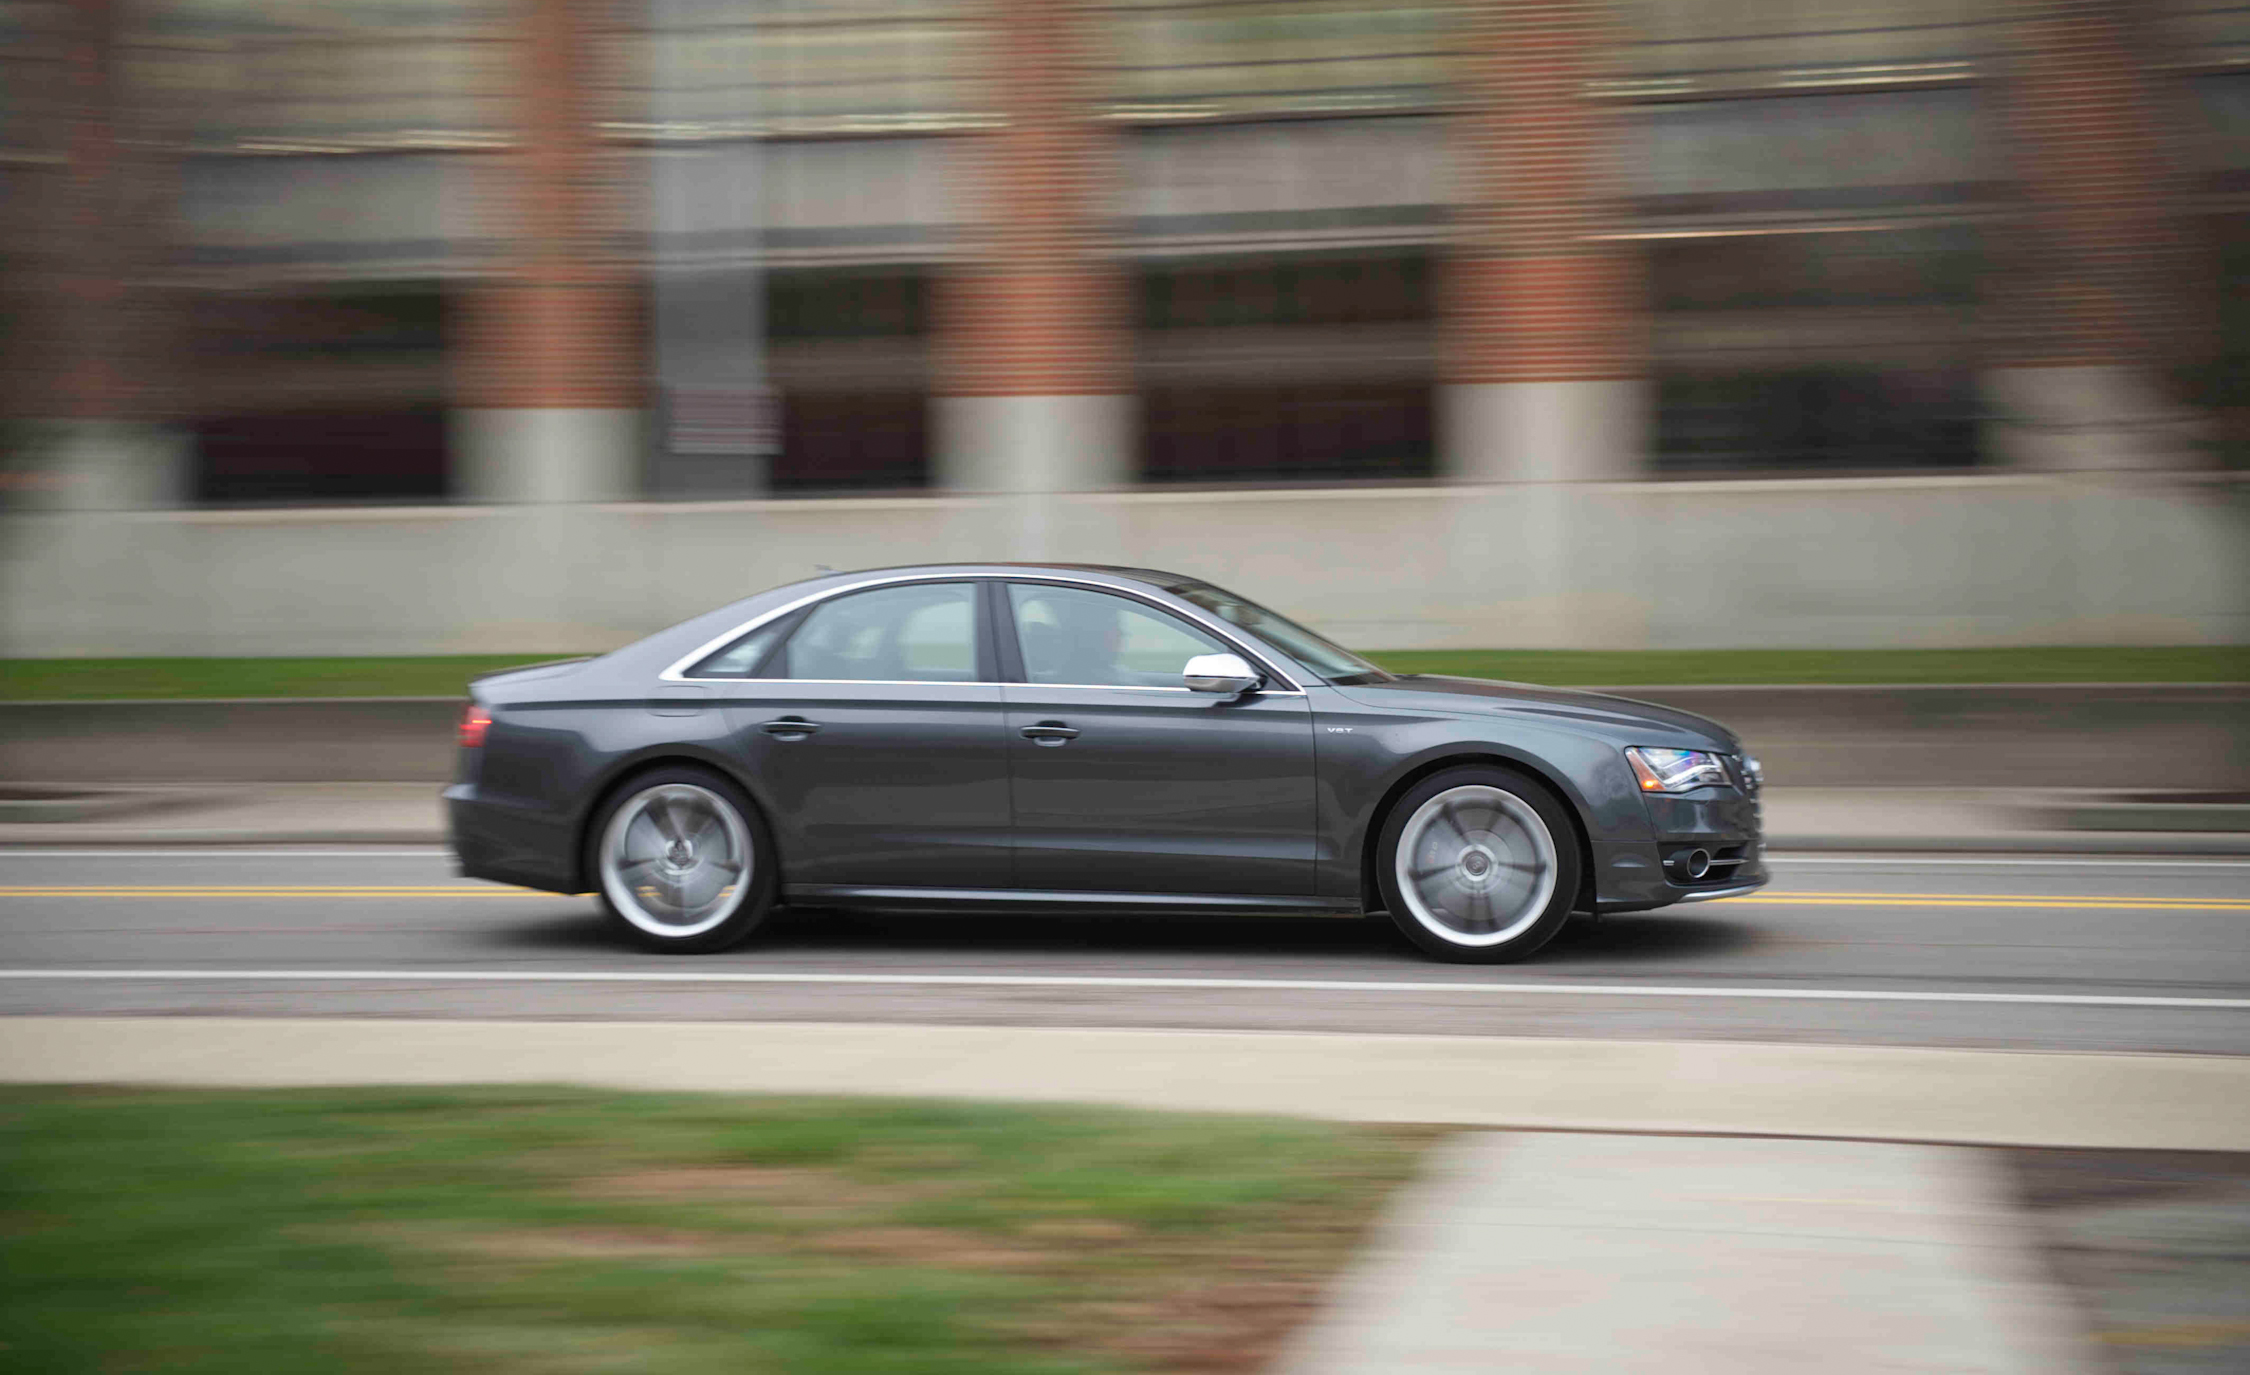 2013 Audi S8 Grey Metallic (View 20 of 25)